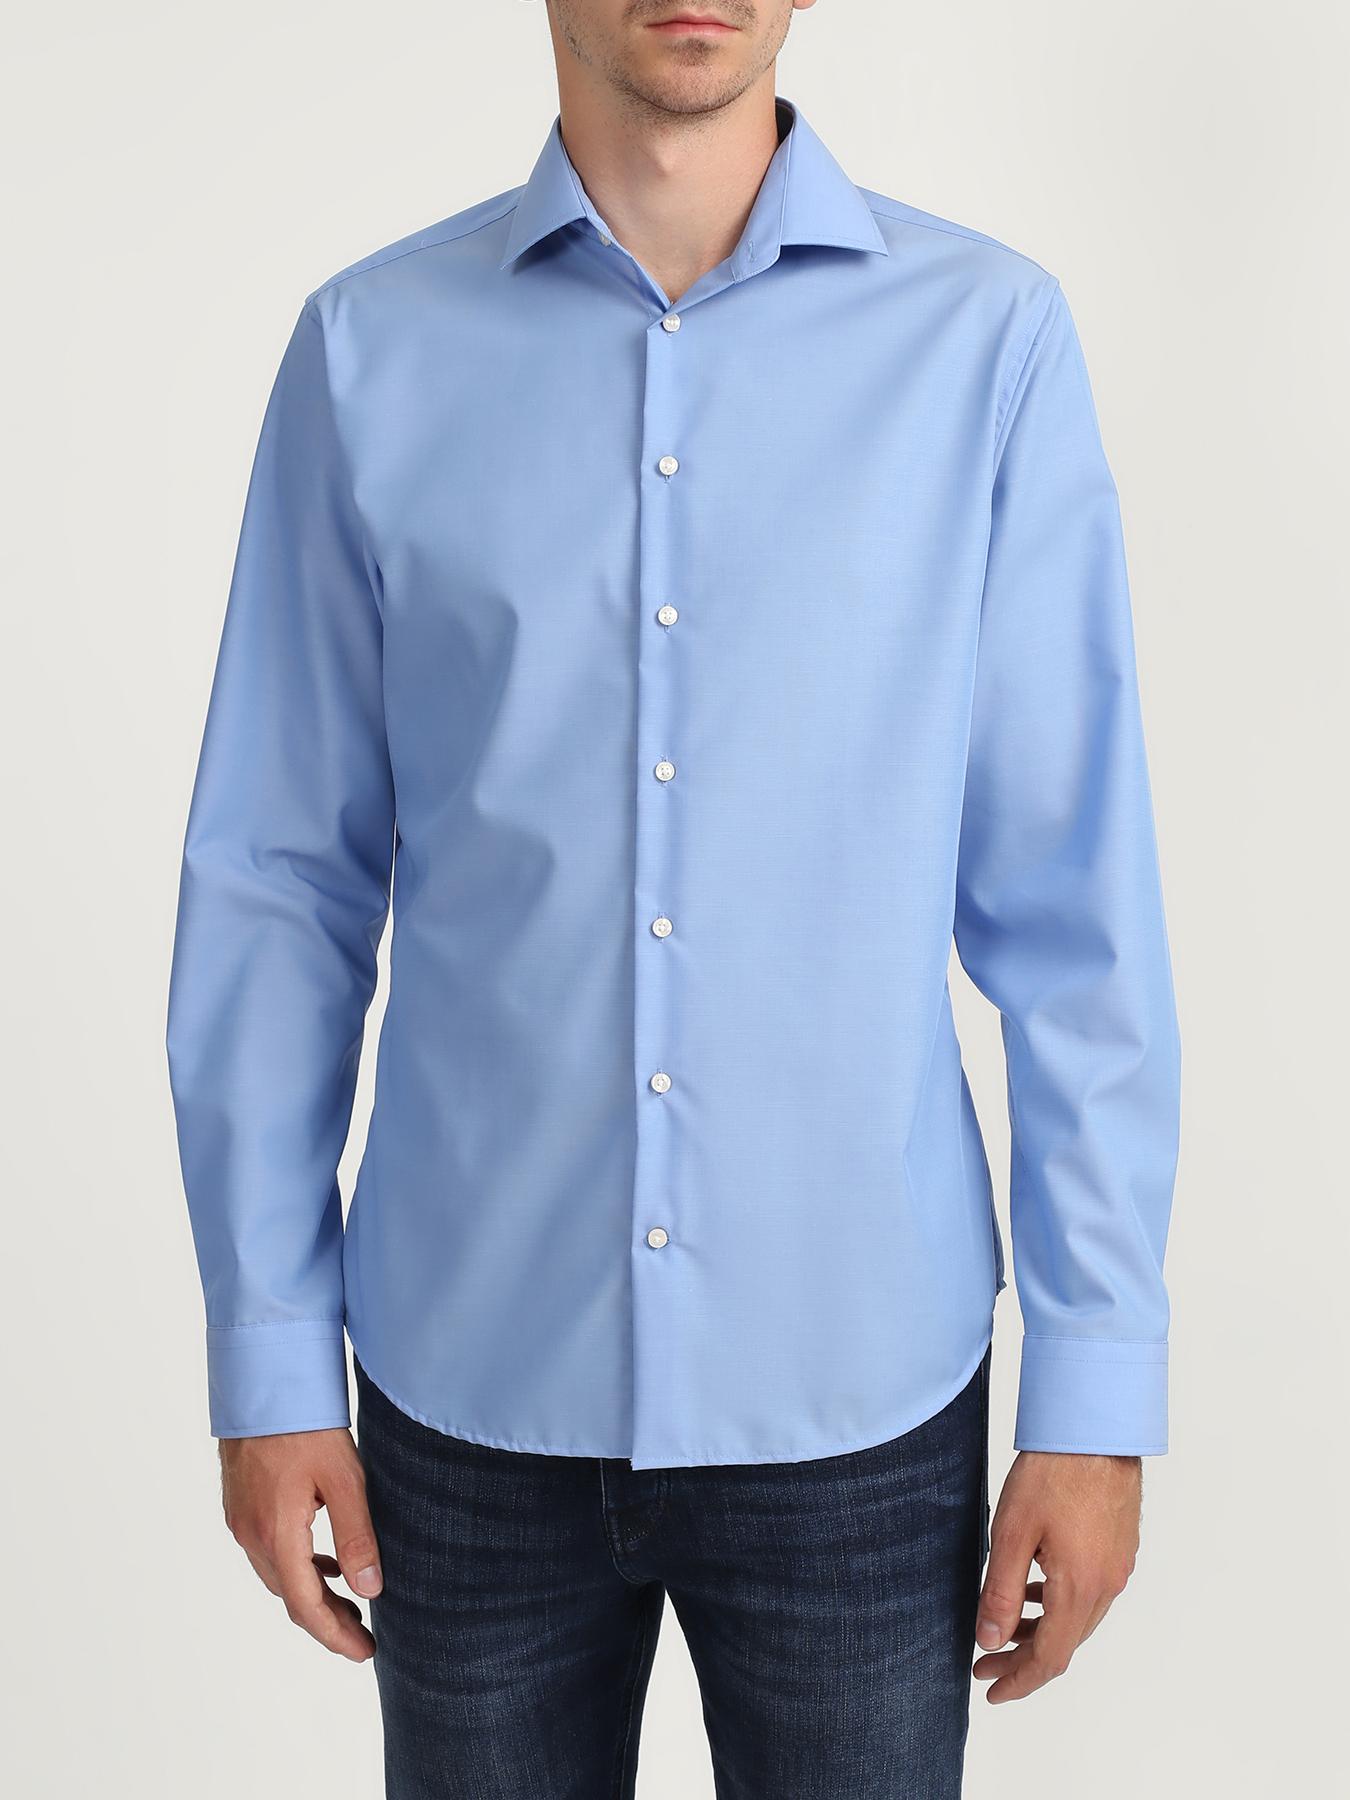 Seidensticker Хлопковая рубашка без карманов 322561-021 Фото 2